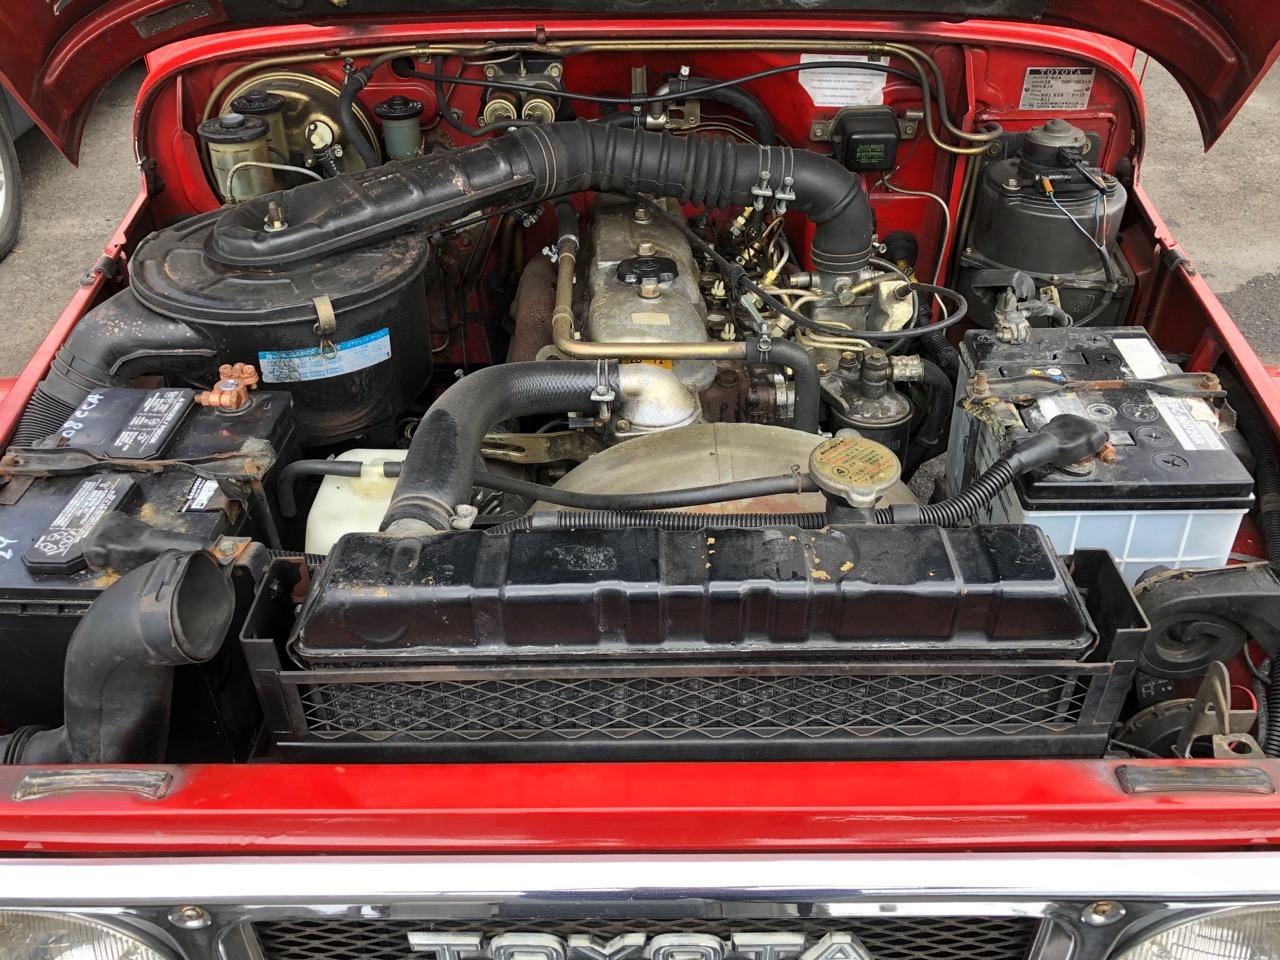 Used-1980-Toyota-Land-Cruiser-BJ40-4WD---RHD